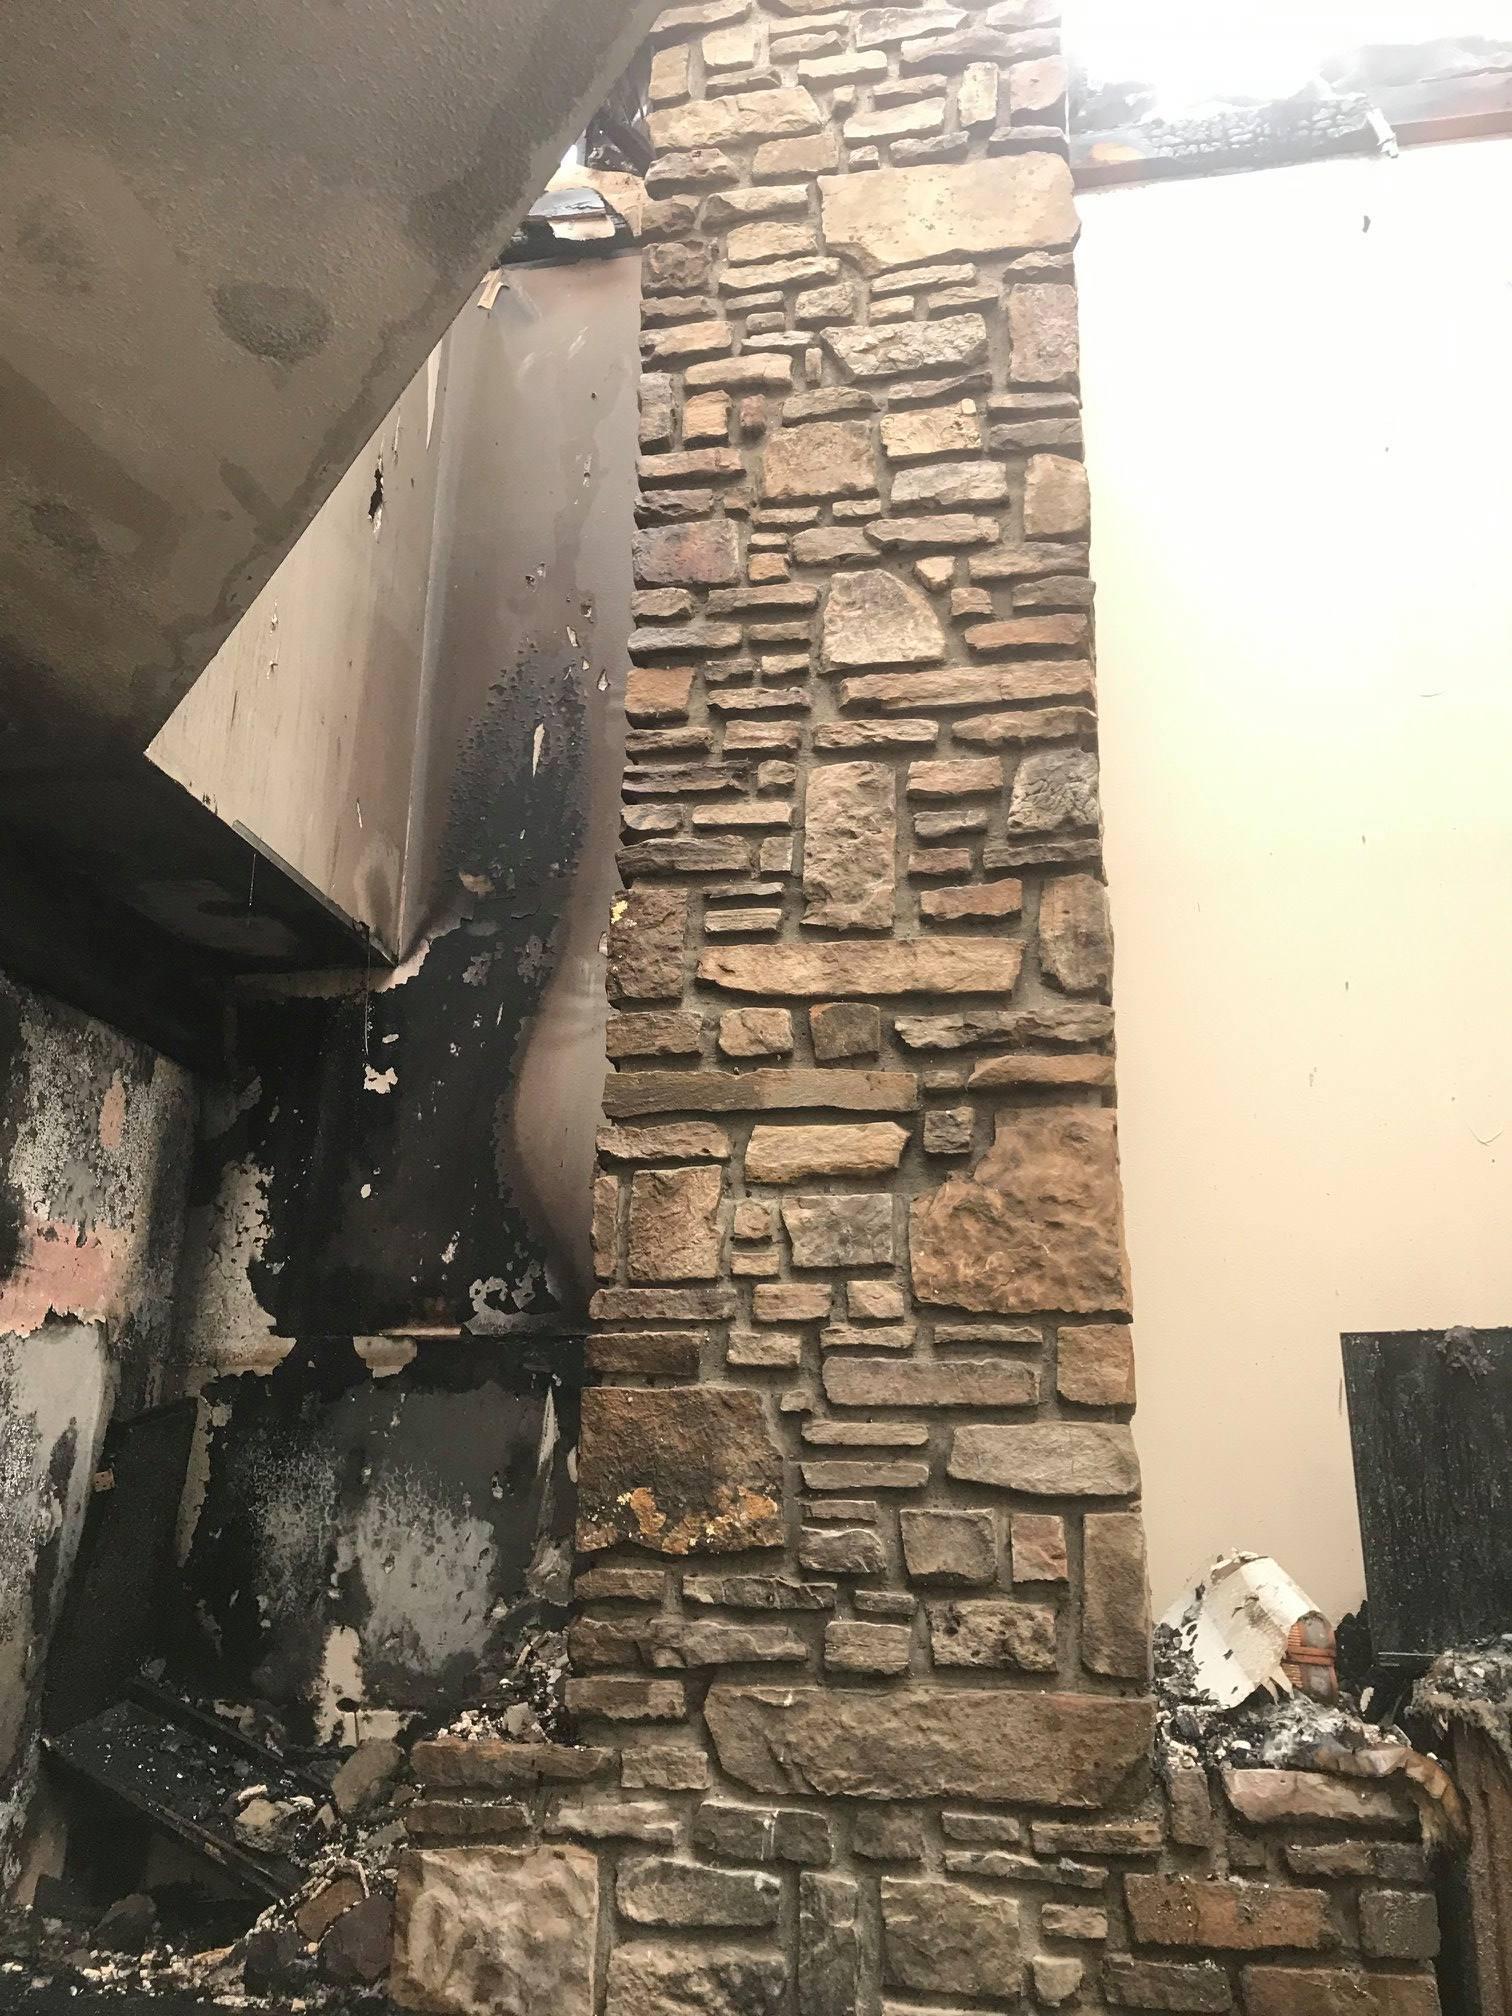 Courtesy of Eureka Springs Fire & EMS.